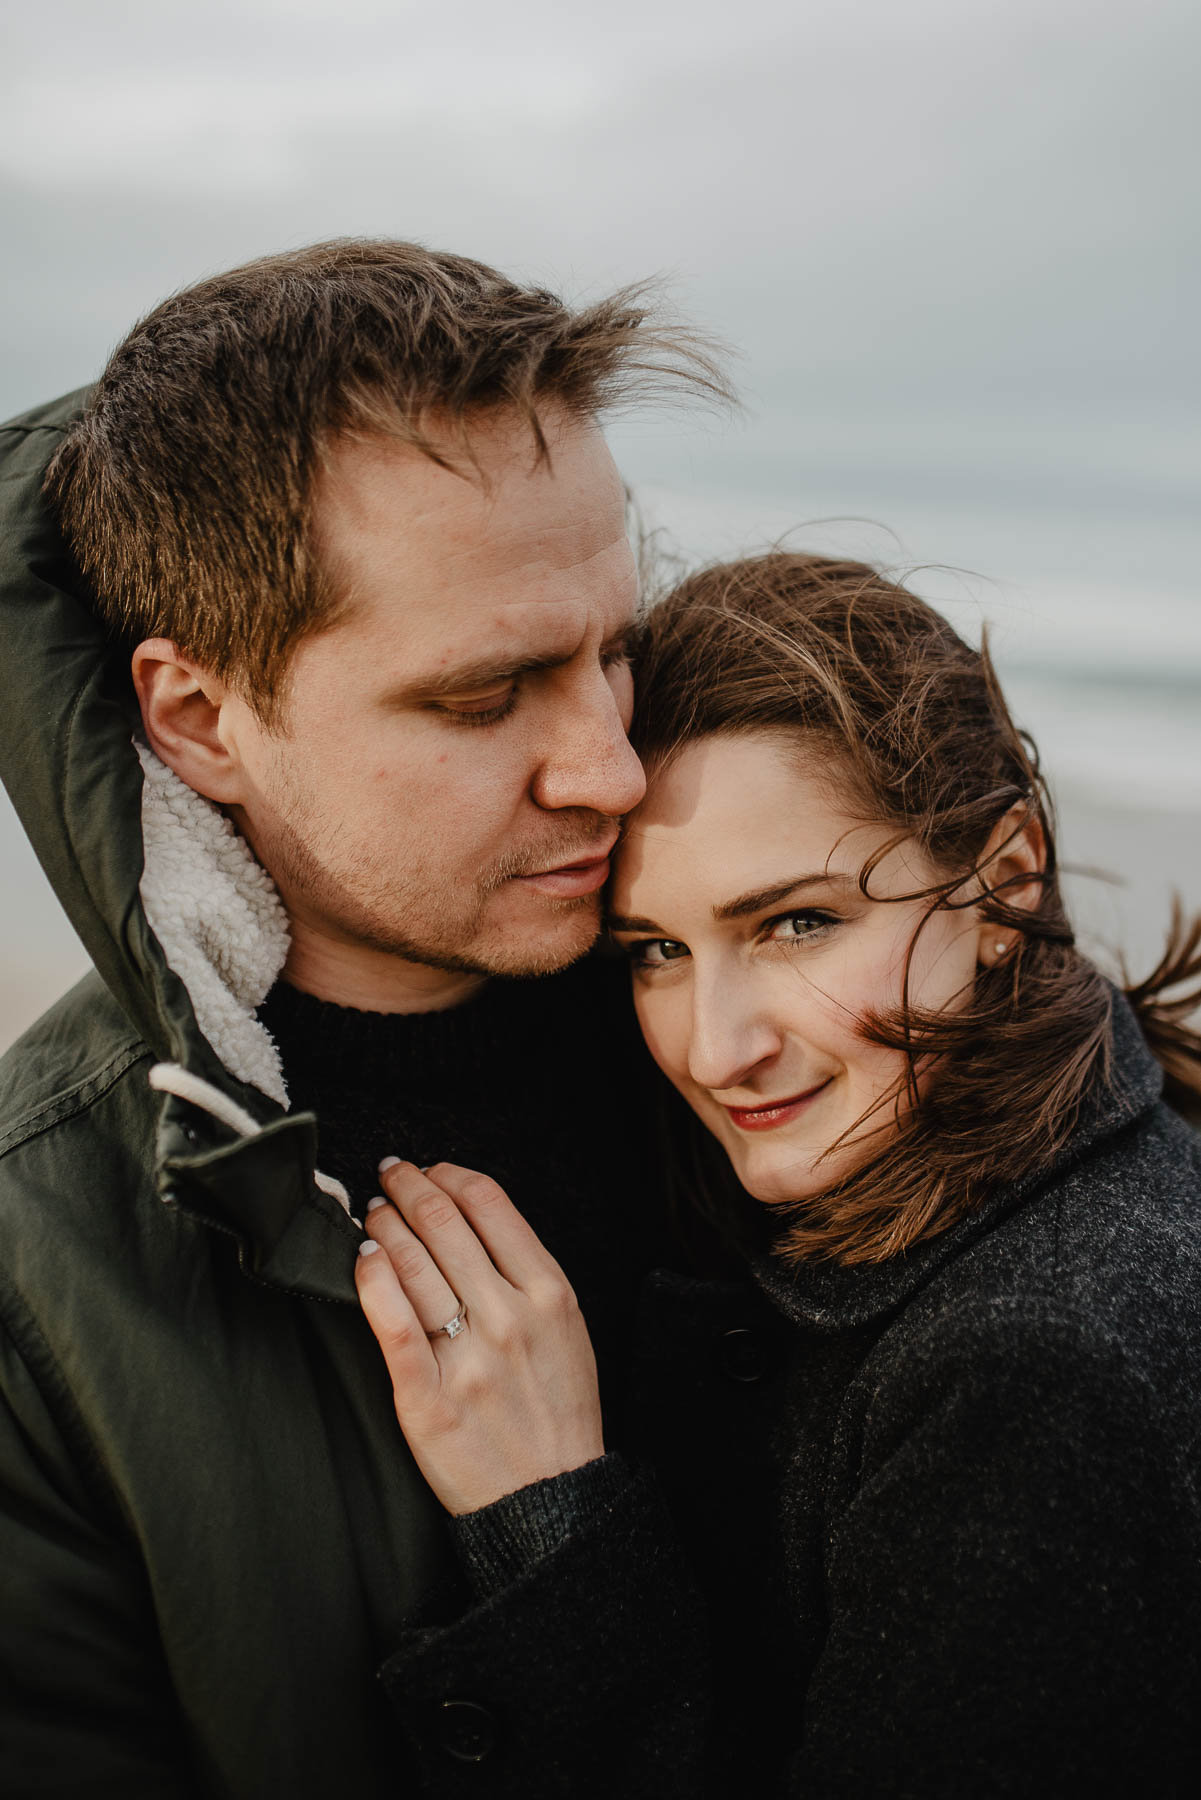 belfast-wedding-engagement-photography-6.jpg